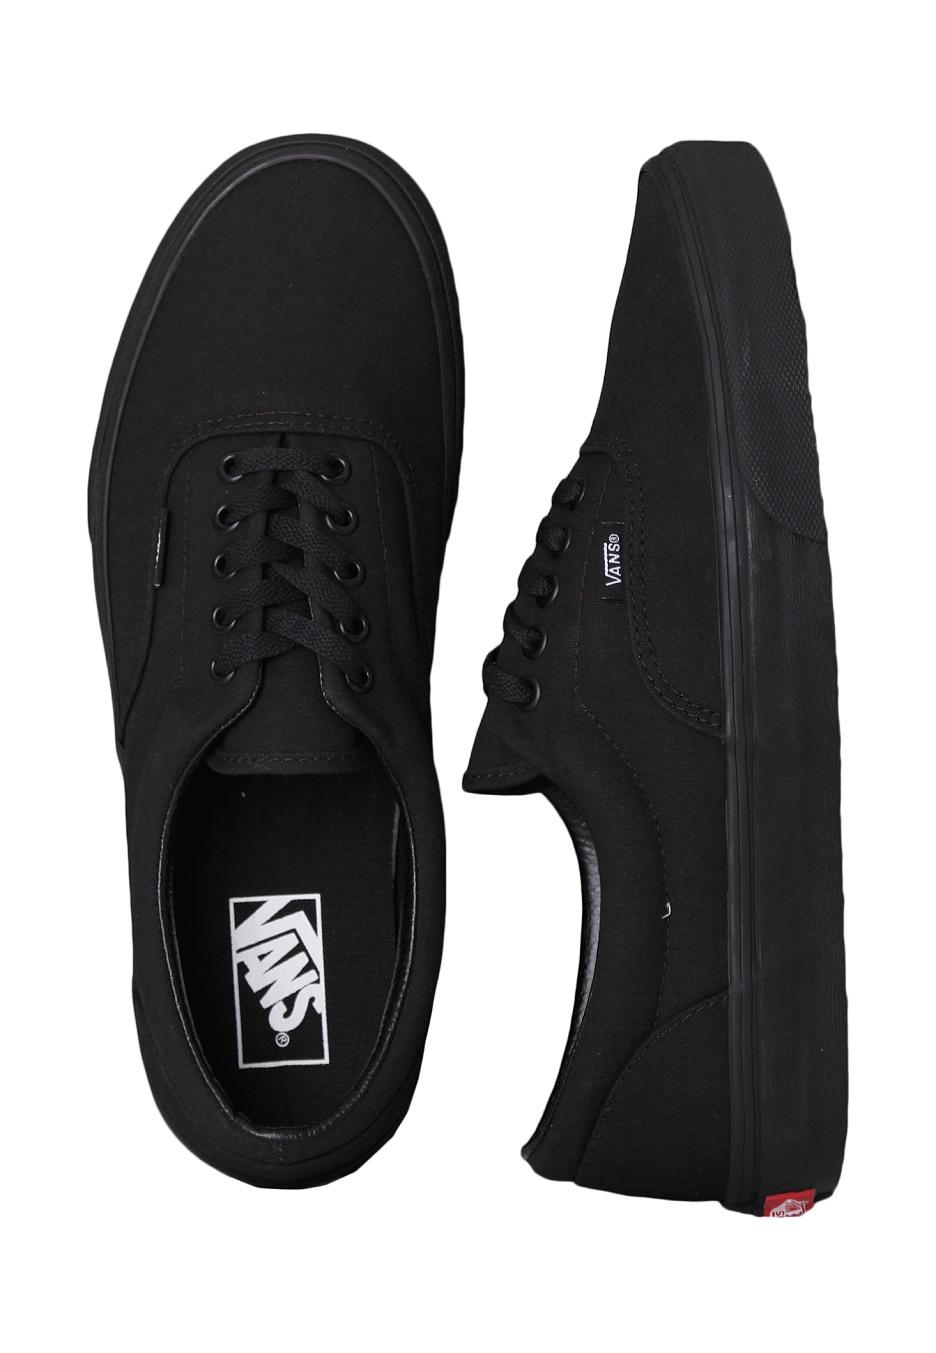 Vans - Era Black Black - Shoes - Impericon.com UK 8823861968